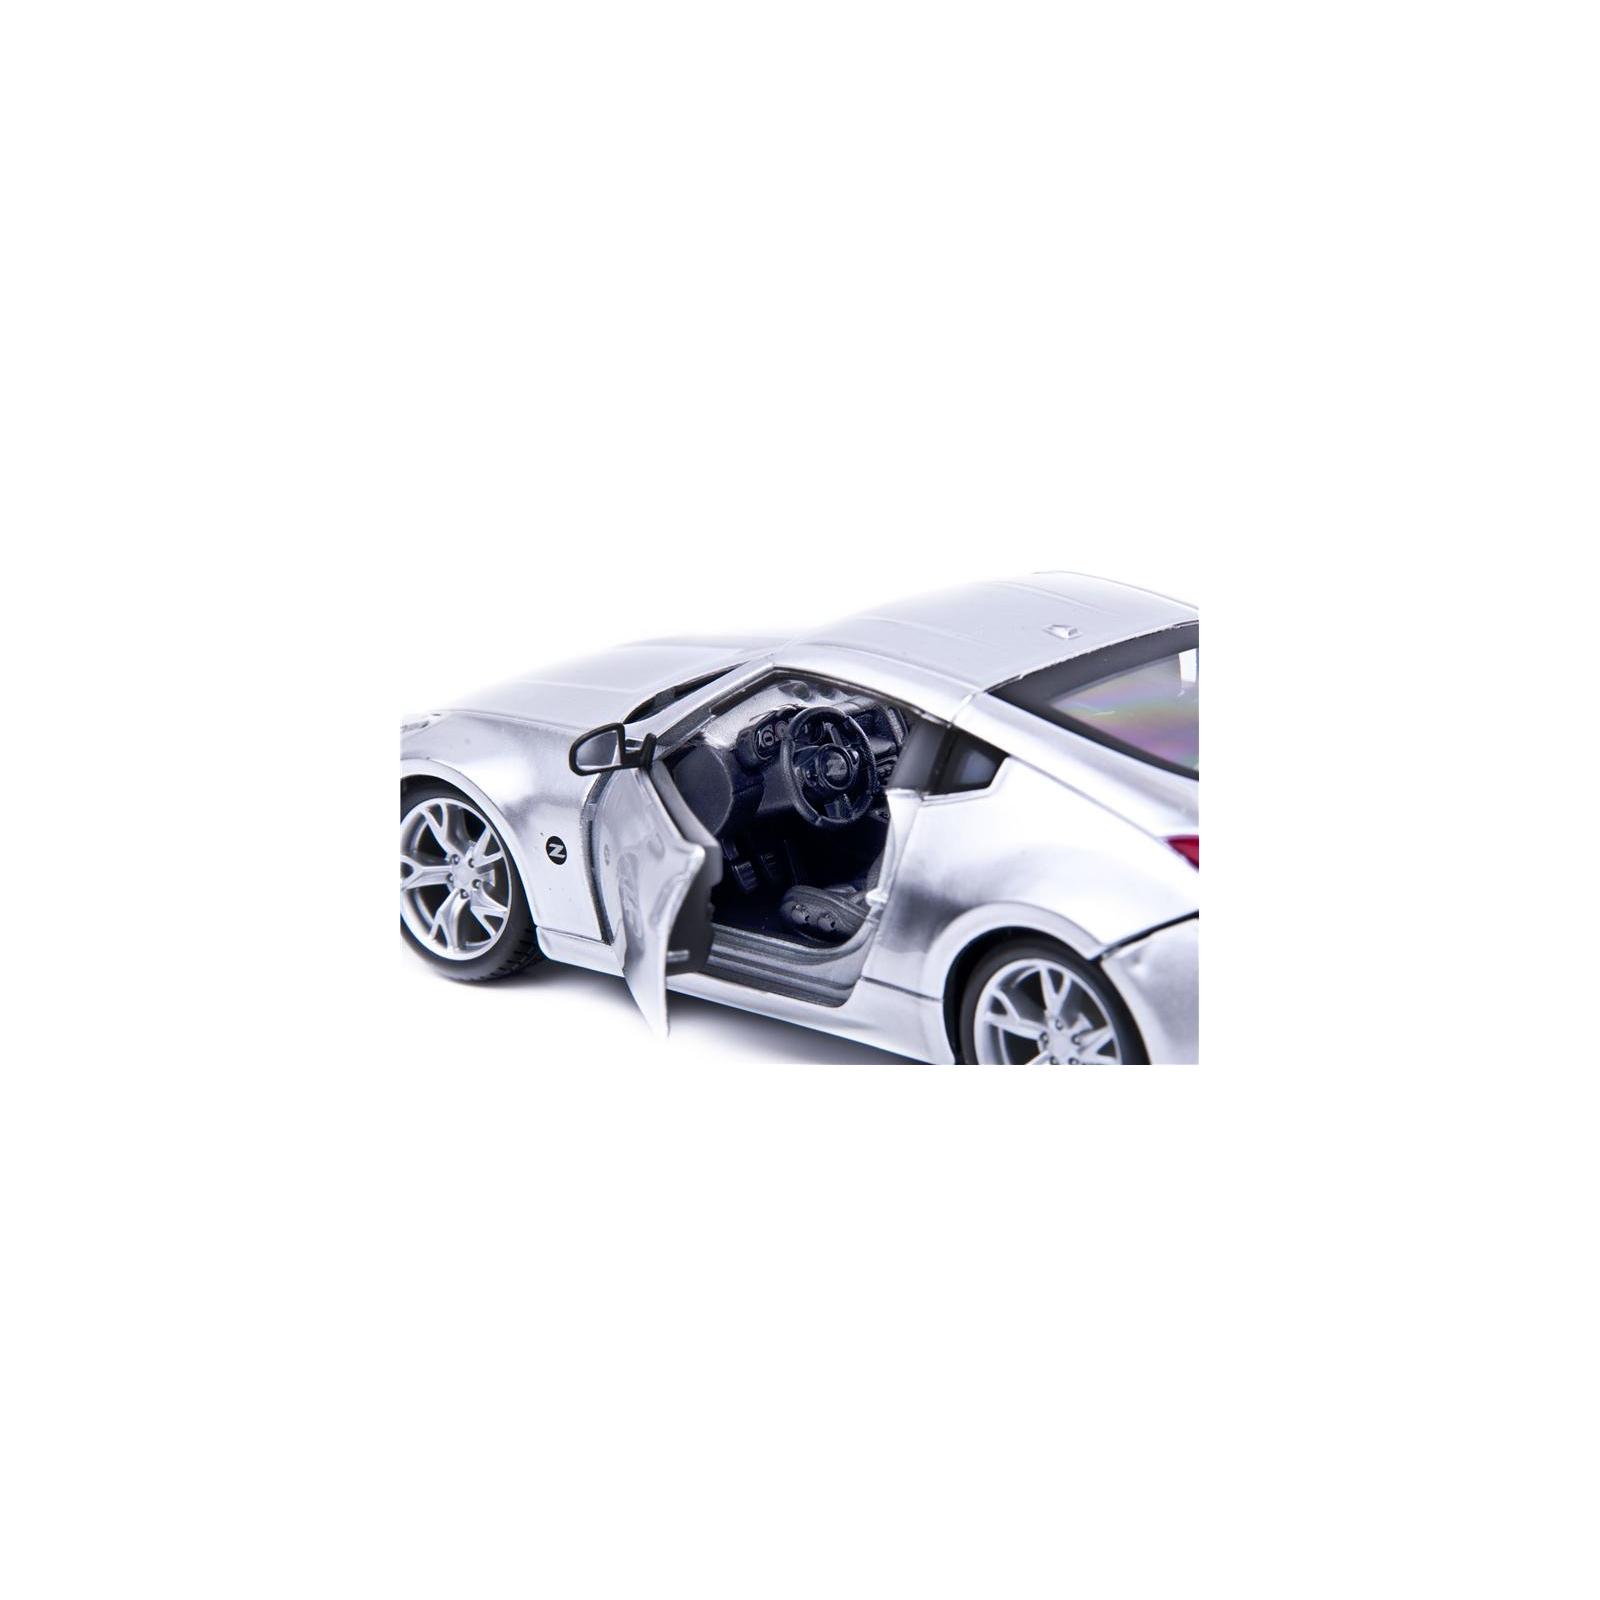 Машина Maisto Nissan 370Z 2009 (1:24) серебристый (31200 silver) изображение 4